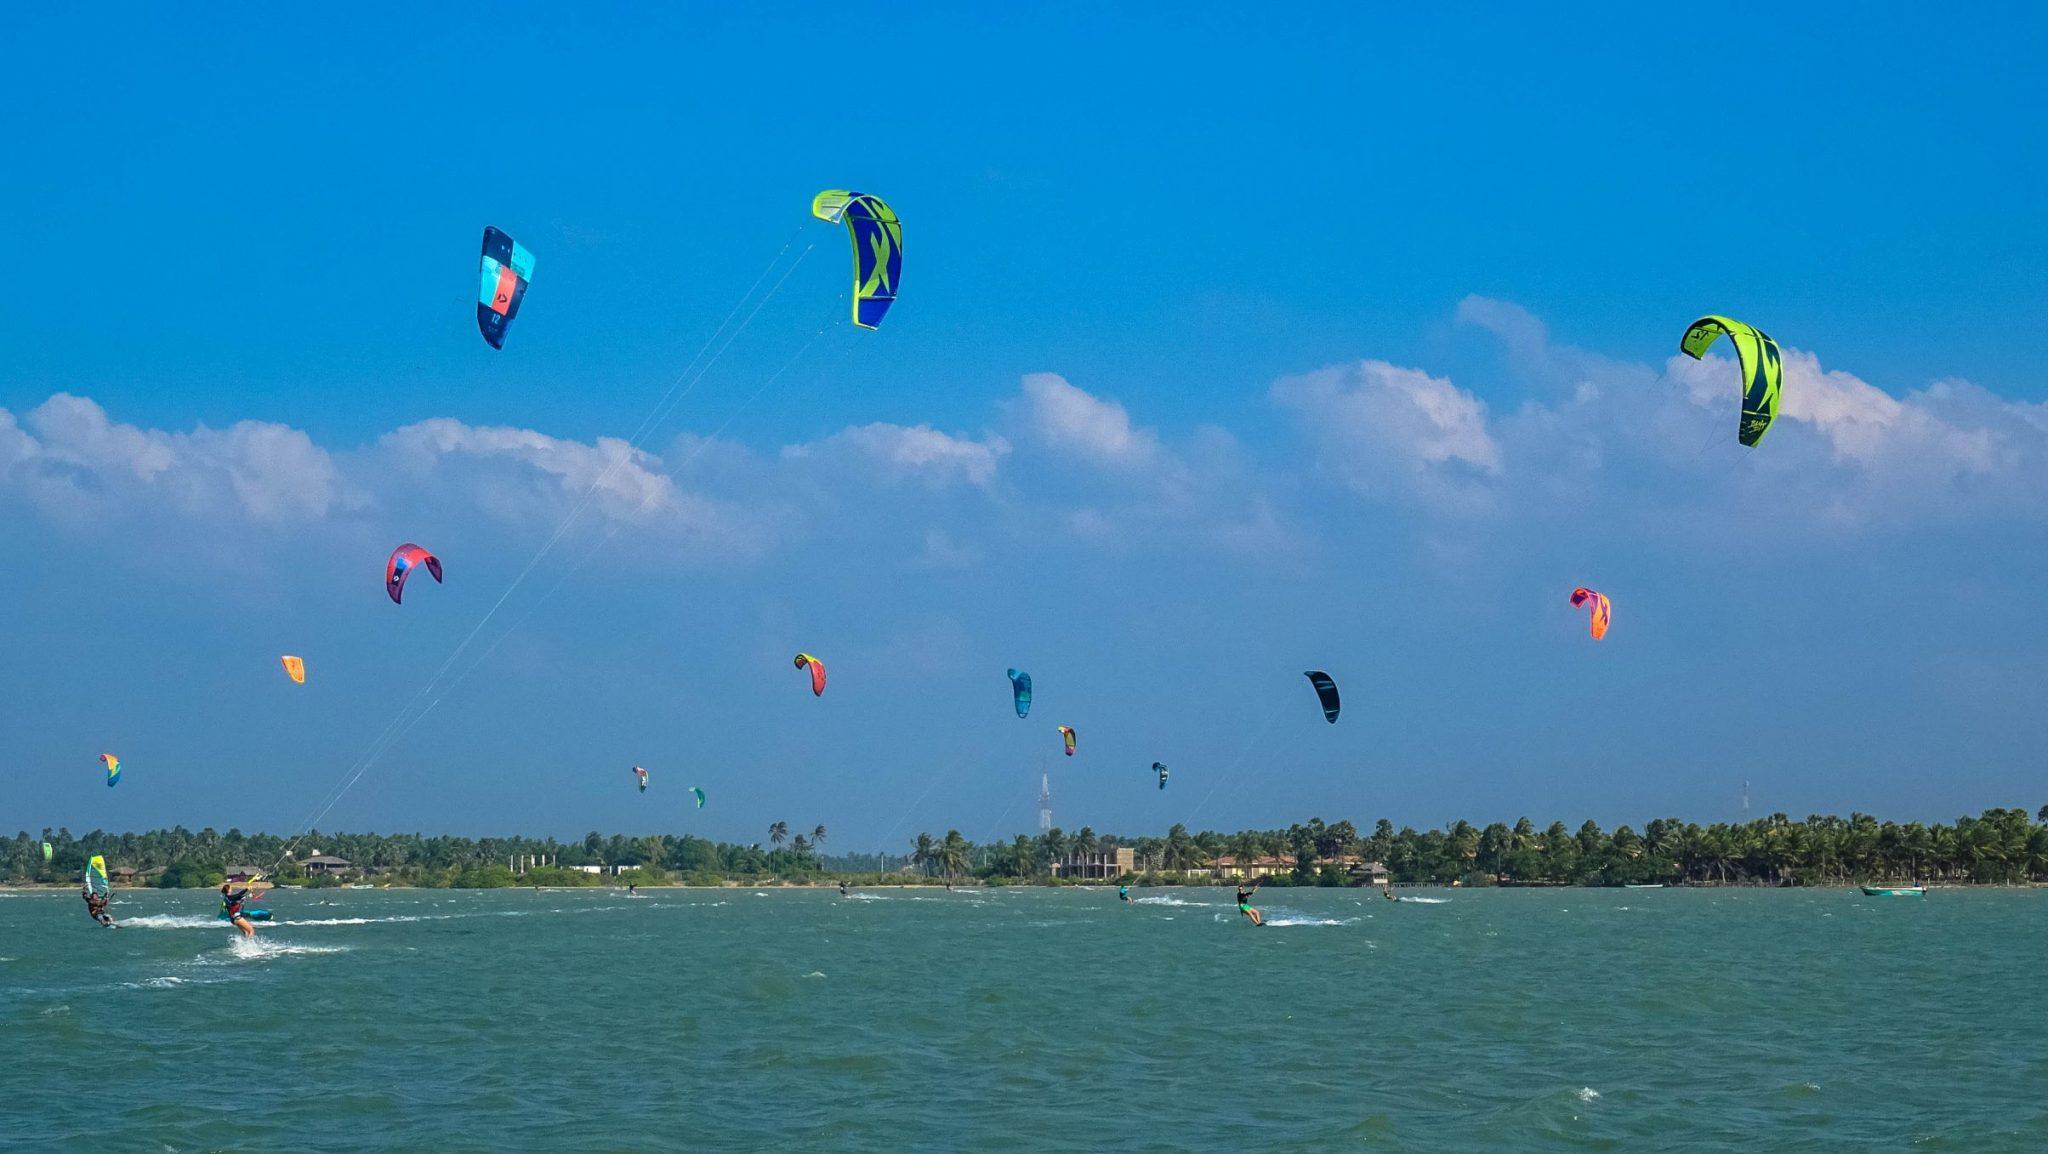 Prorider Trip Sri Lanka Kite Spot Kalpitiya Lagoon Flat Kitesurfers